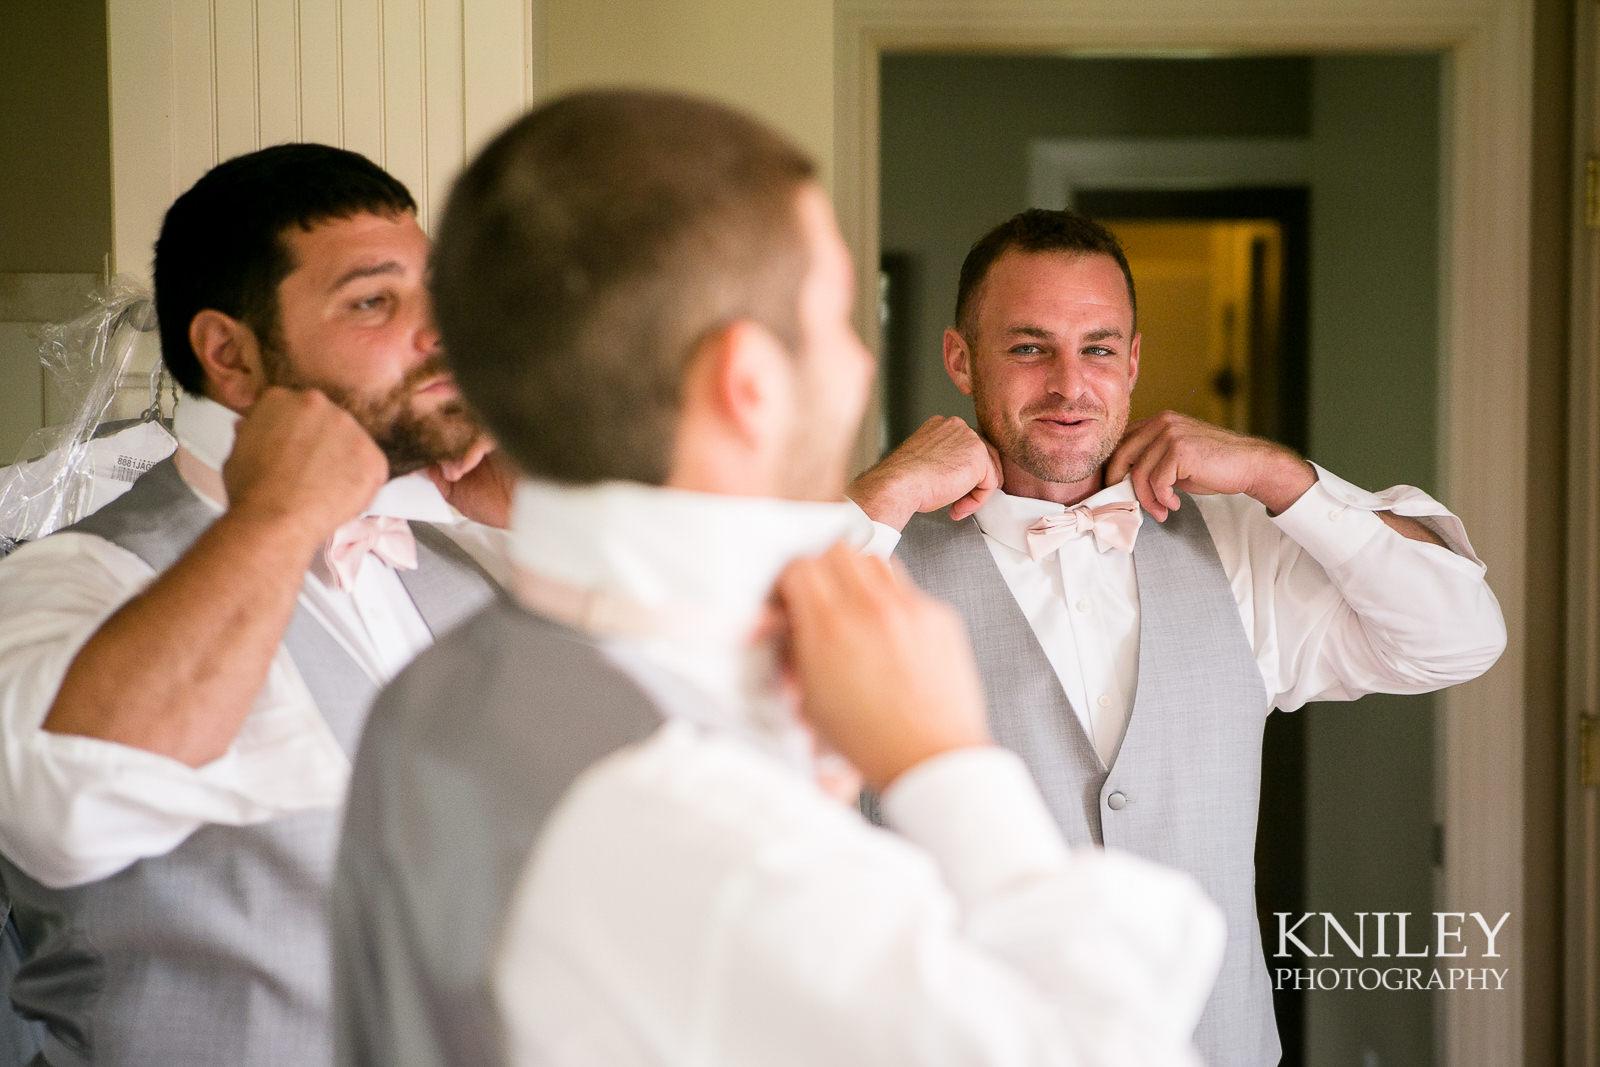 039 - Buffalo NY wedding - Preparation pictures - IMG_7341.jpg